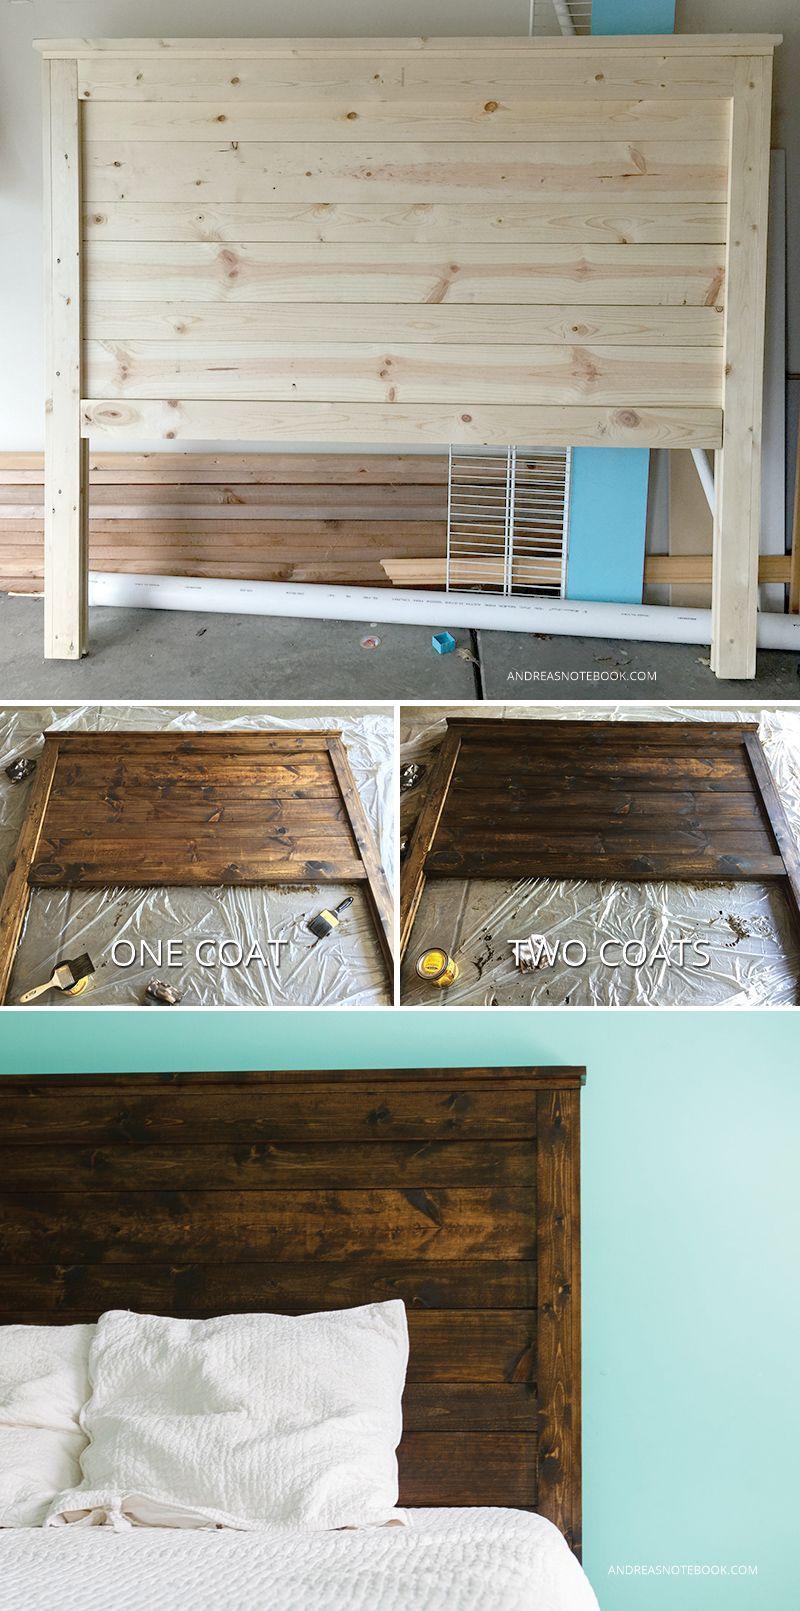 Make your own DIY rustic headboard - AndreasNotebook.com ...